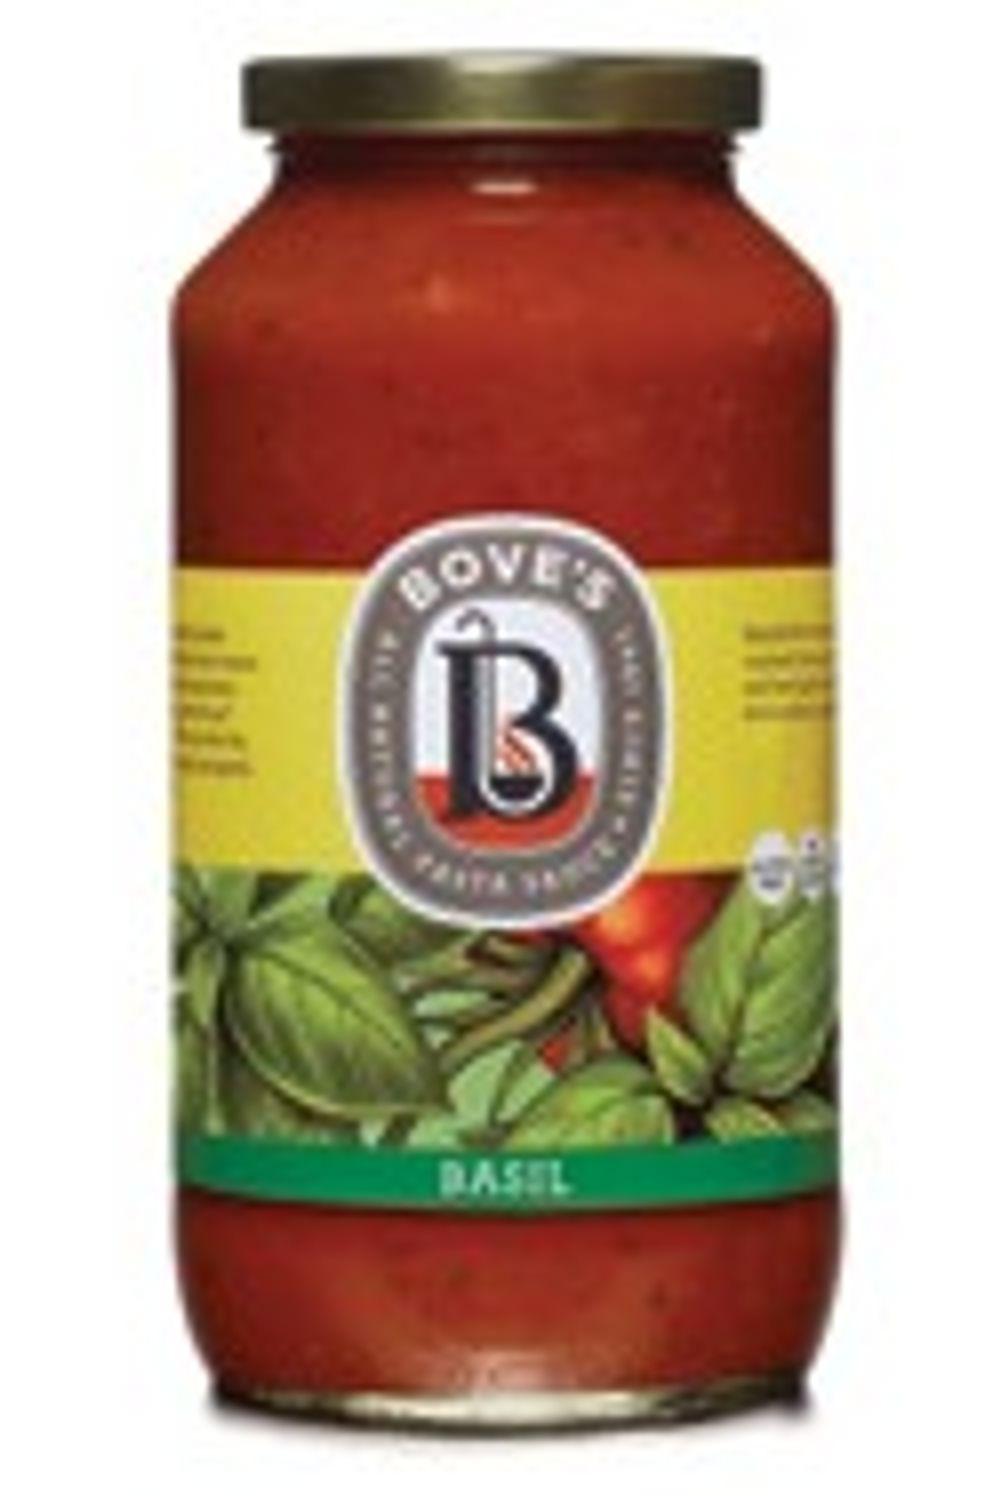 Basil Tomato Sauce